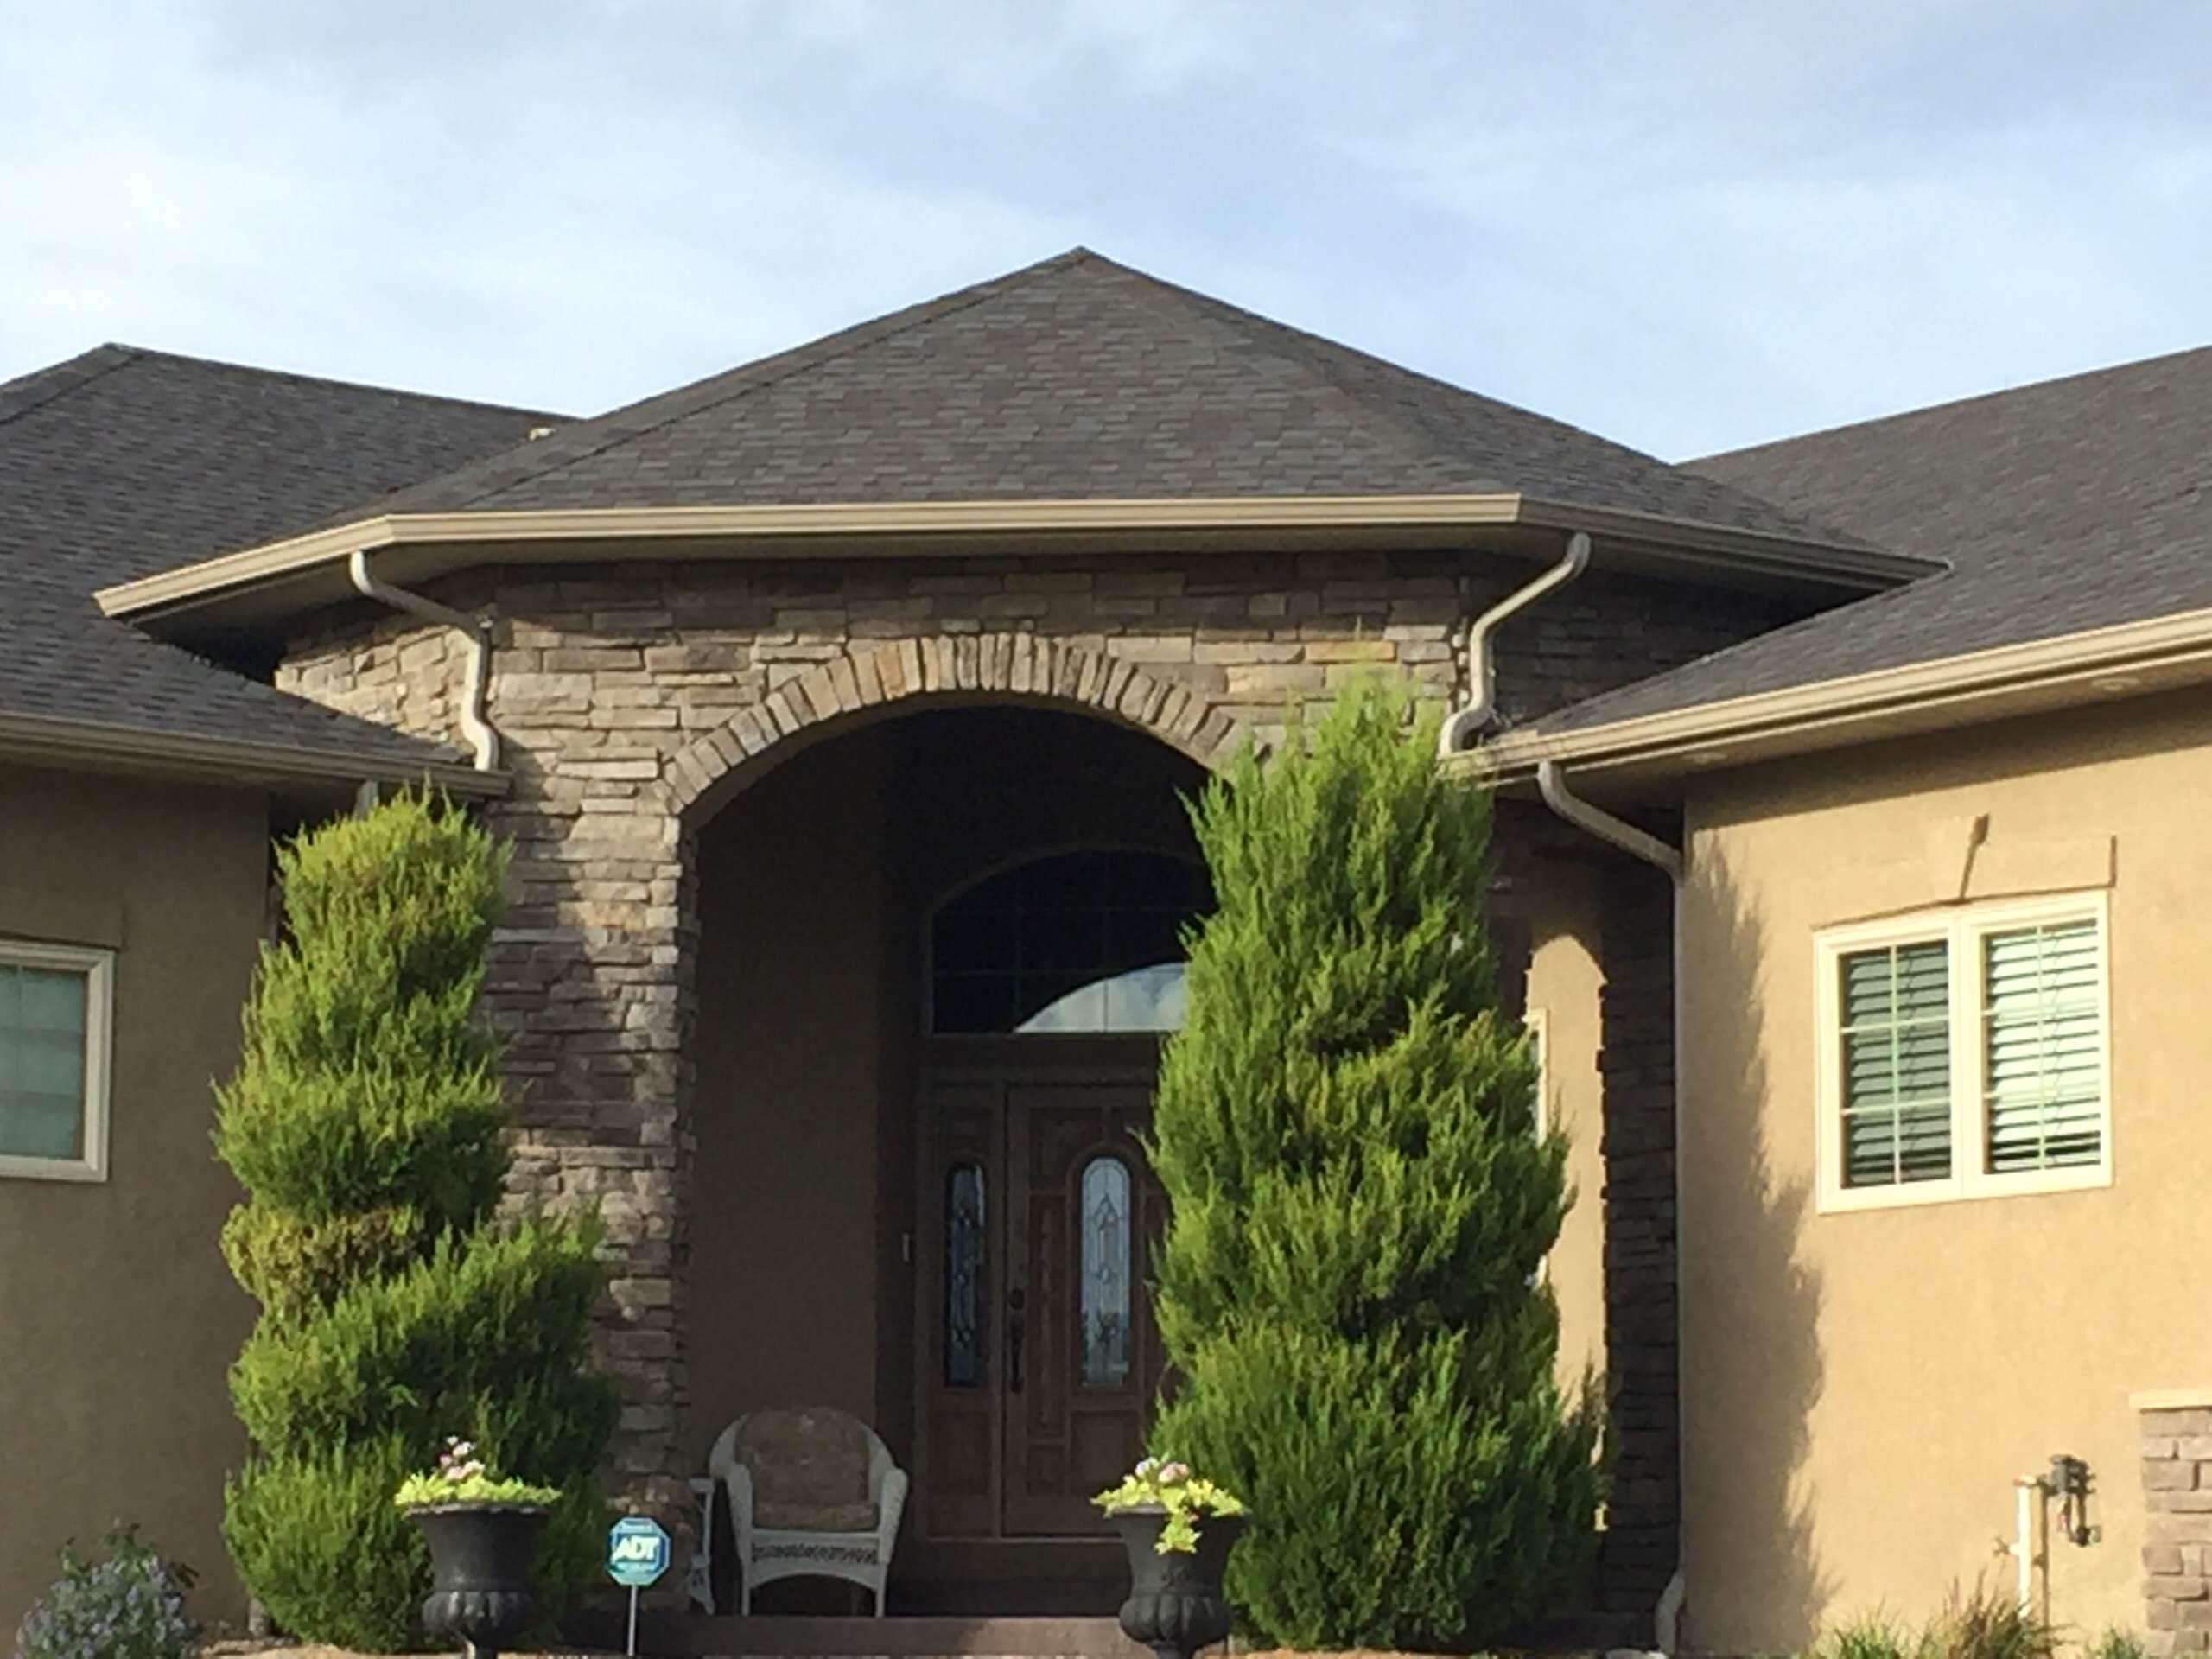 The Sonoma Home